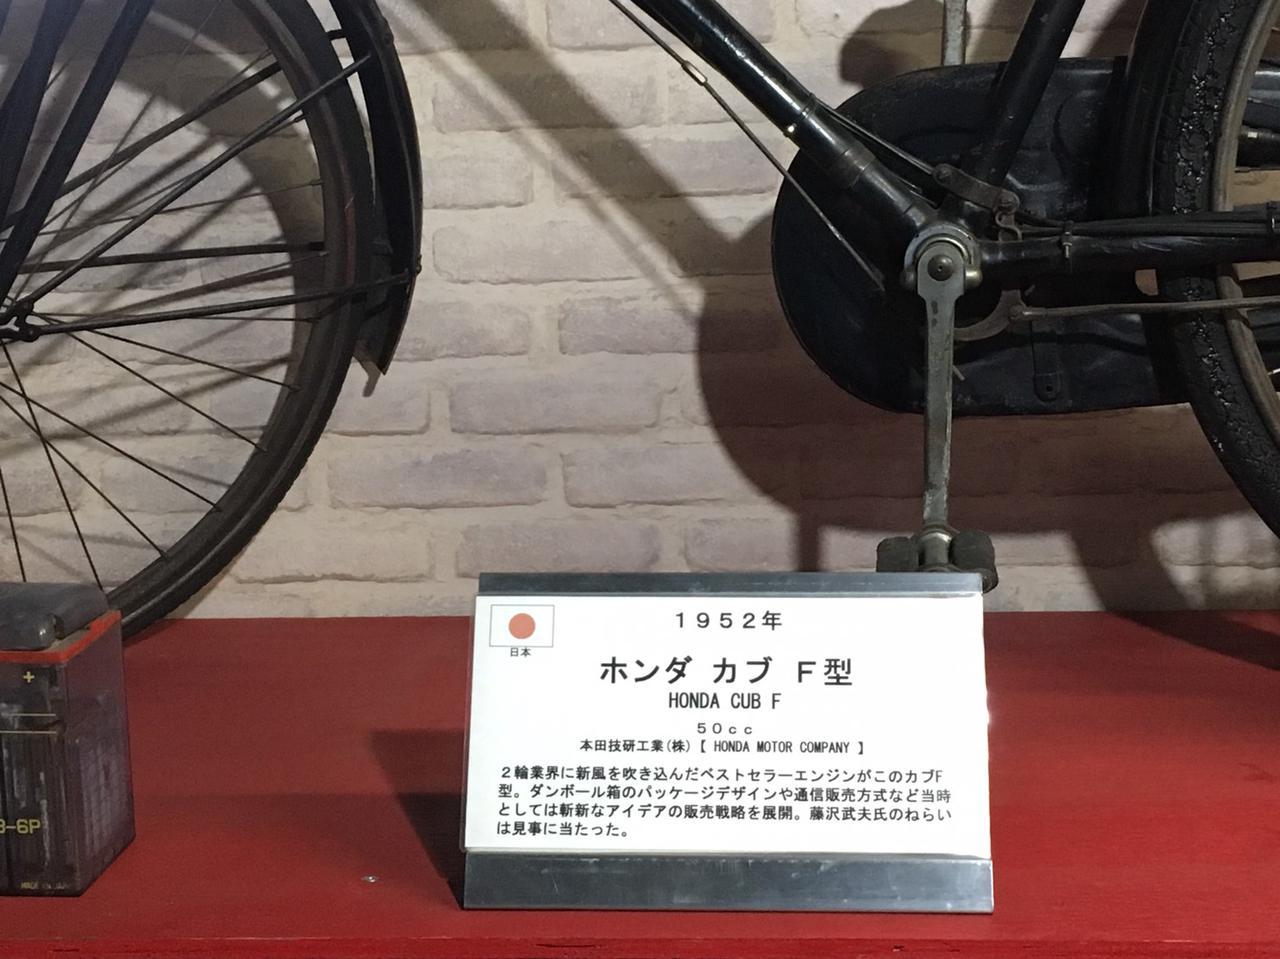 Images : 33番目の画像 - 福山理子が撮影した岩下コレクションの写真 - webオートバイ